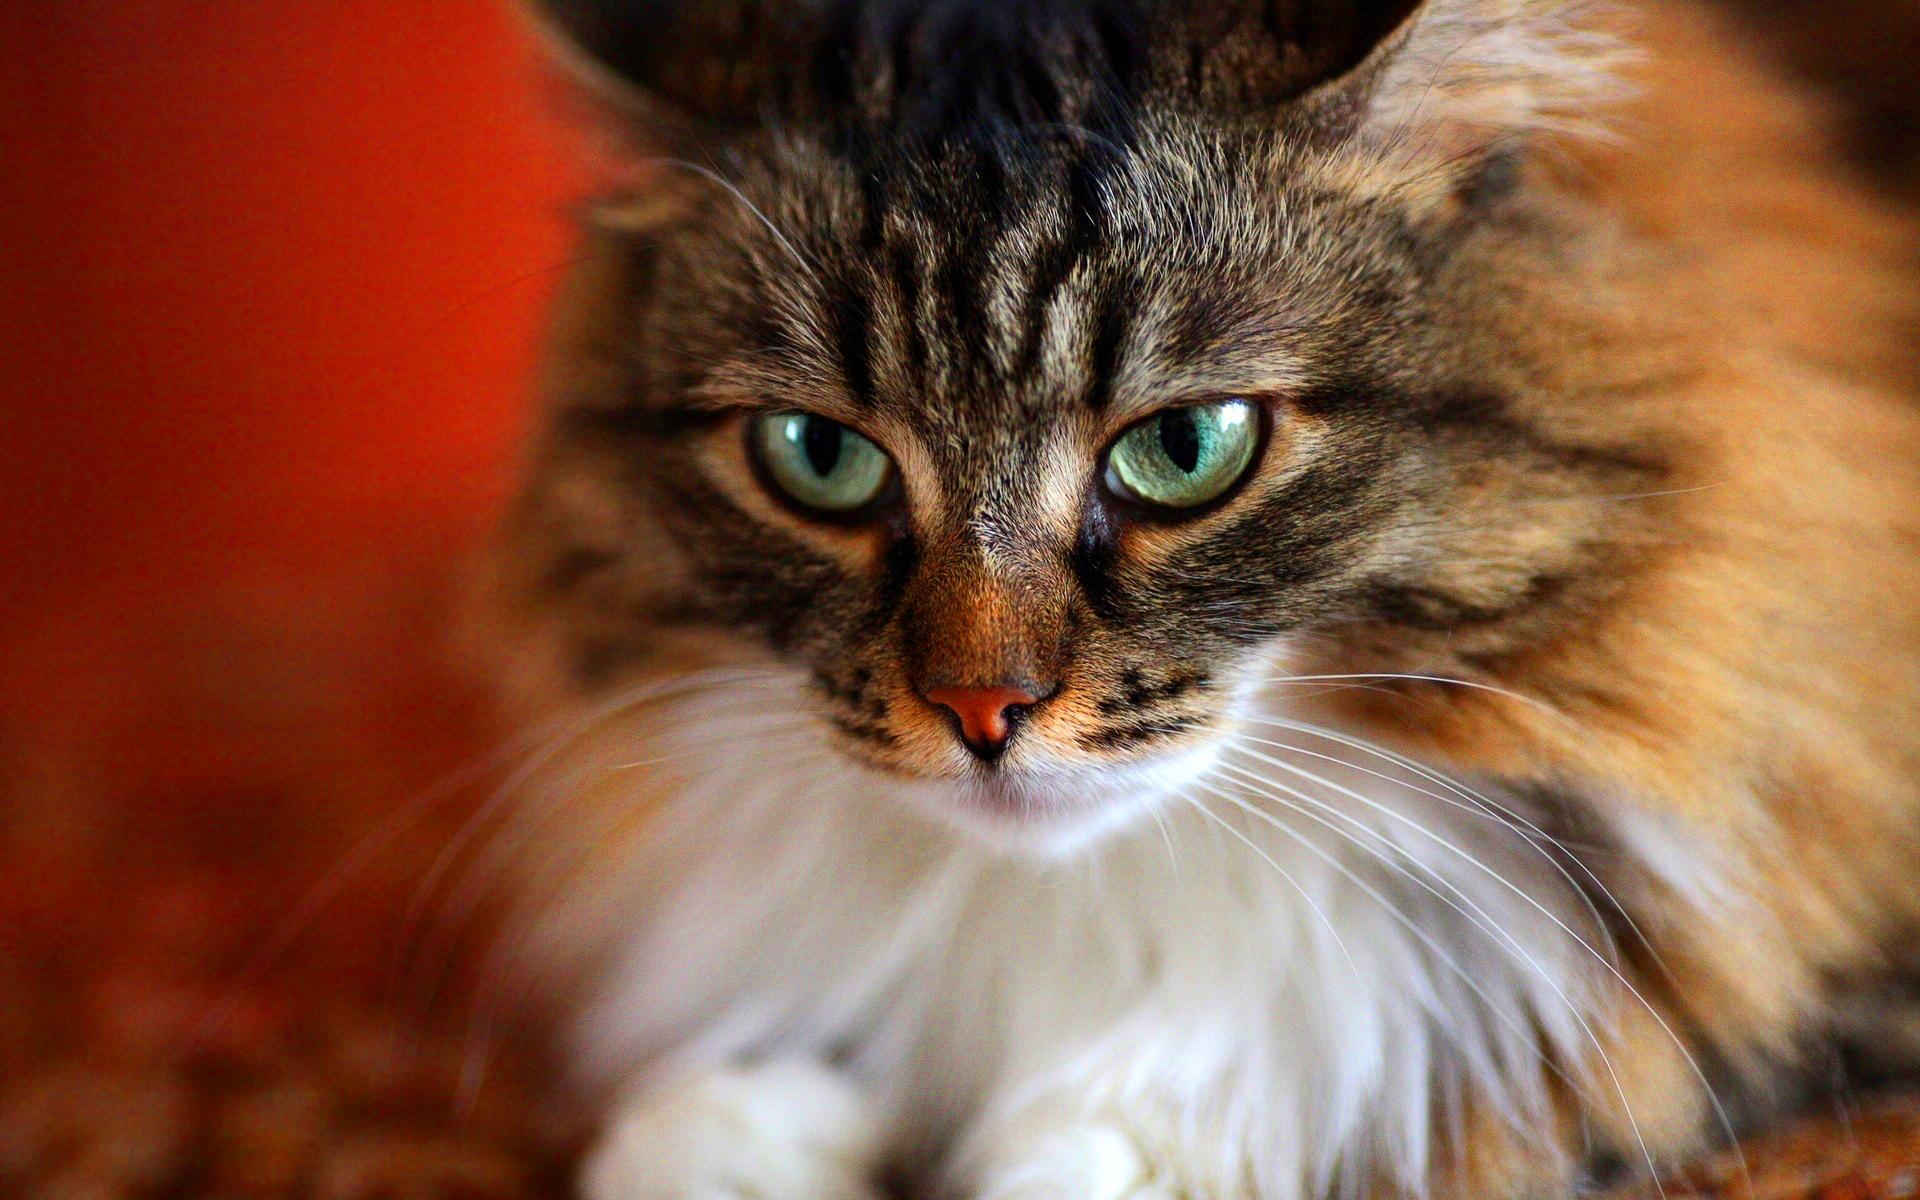 Download Wallpaper Cute Cat Fuzzy Cat Download Hd Desktop Wallpapers 4k Hd